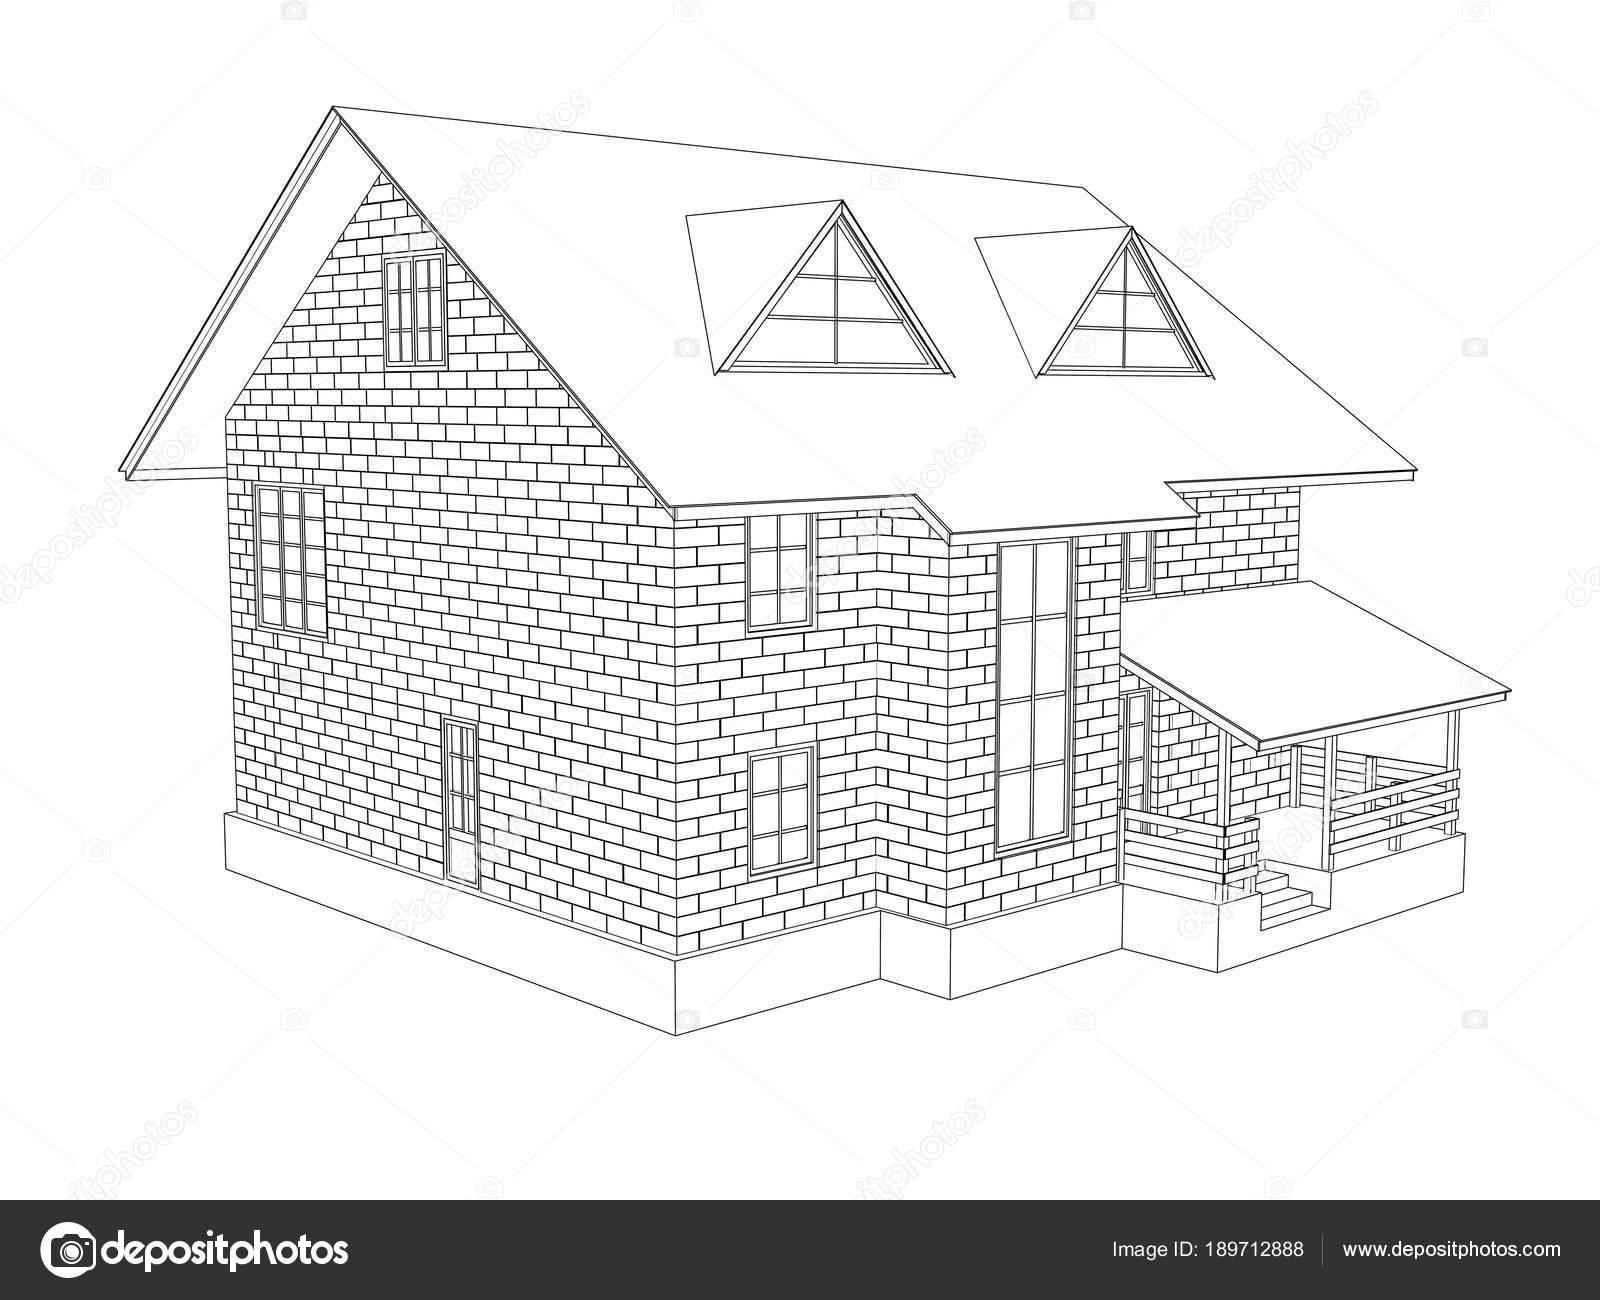 Illustration Two Storey Cottage House Line Drawing Walls Blocks